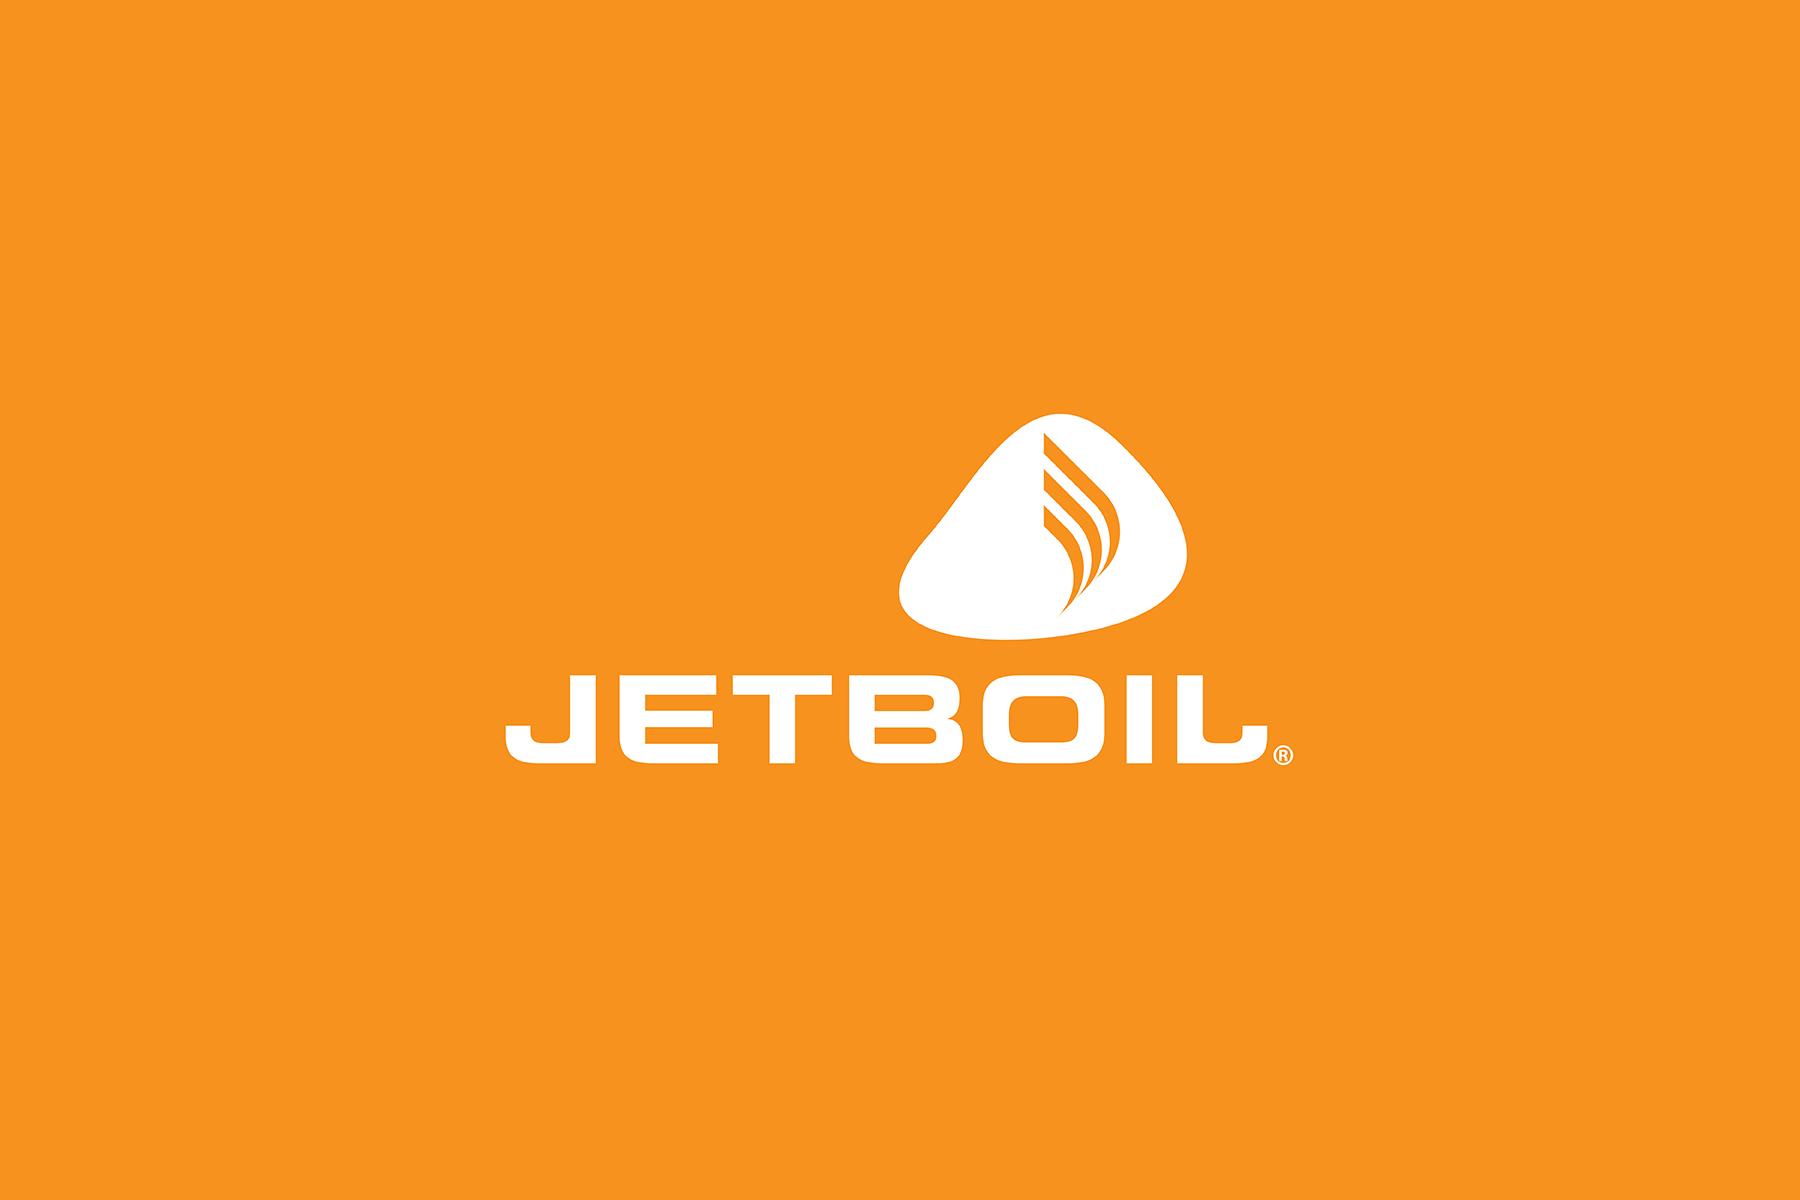 Jetboil Brand Evolution